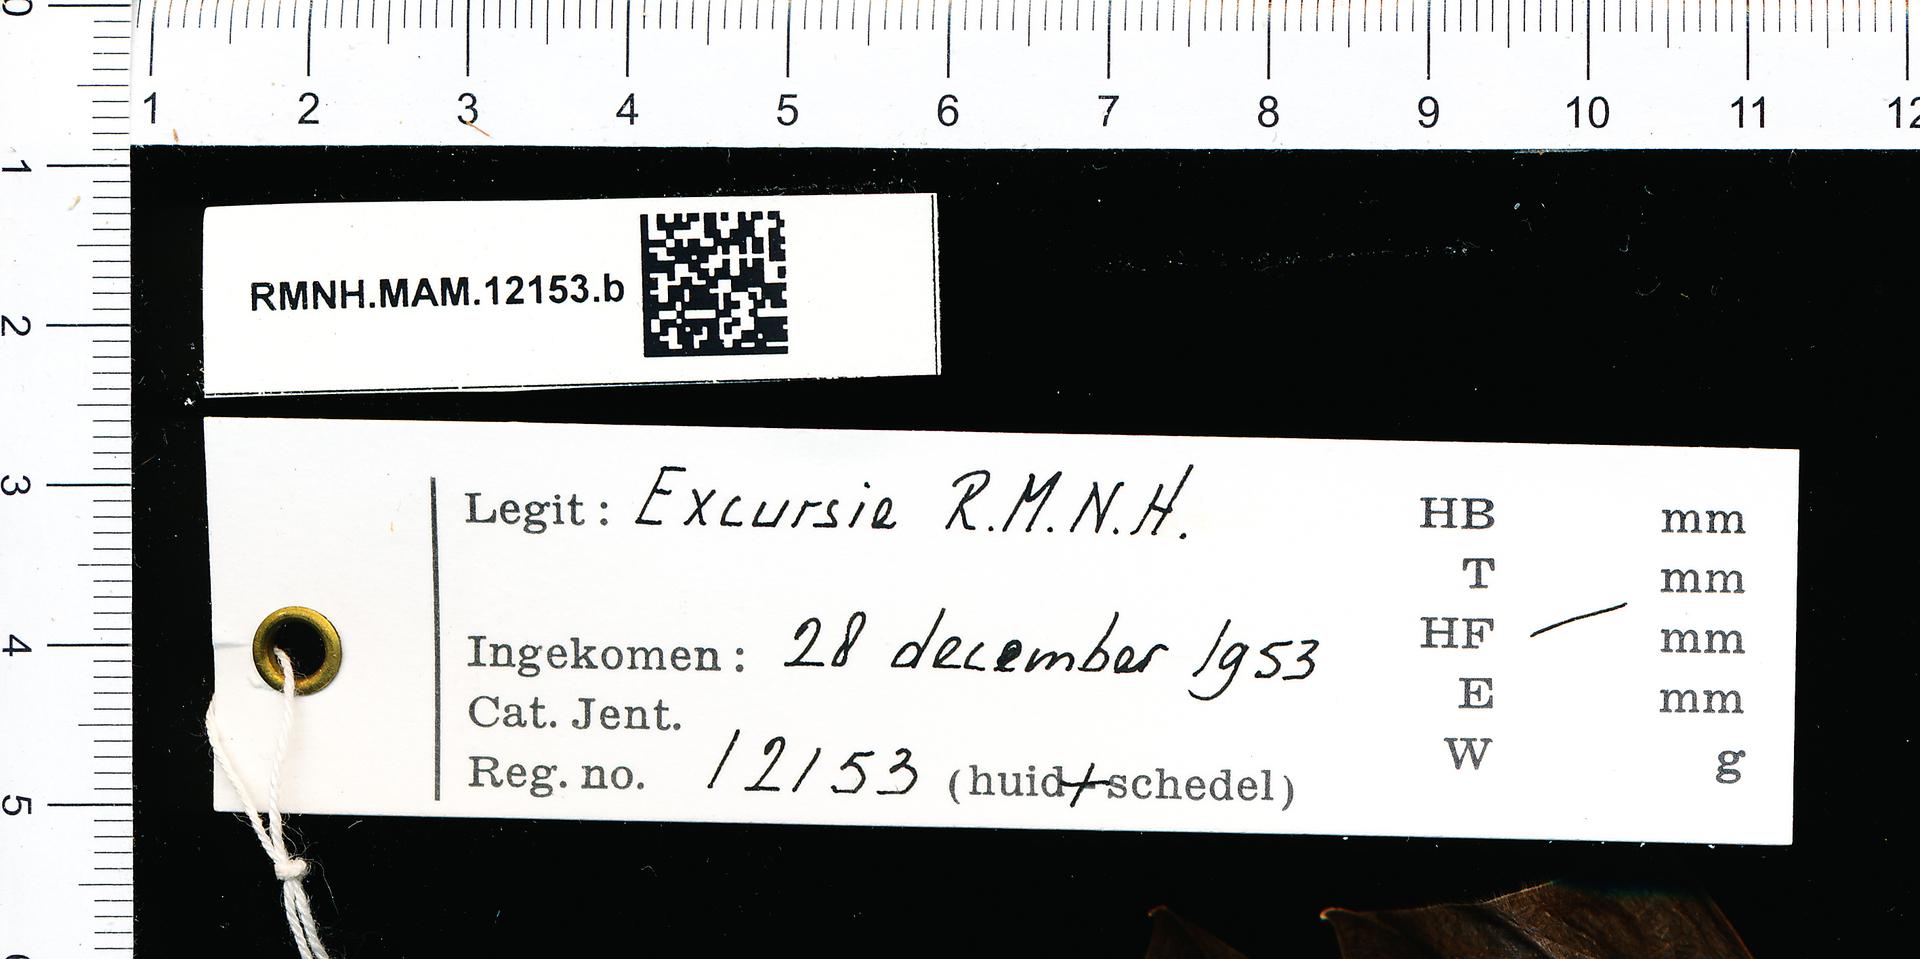 RMNH.MAM.12153.b | Rhinolophus hipposideros